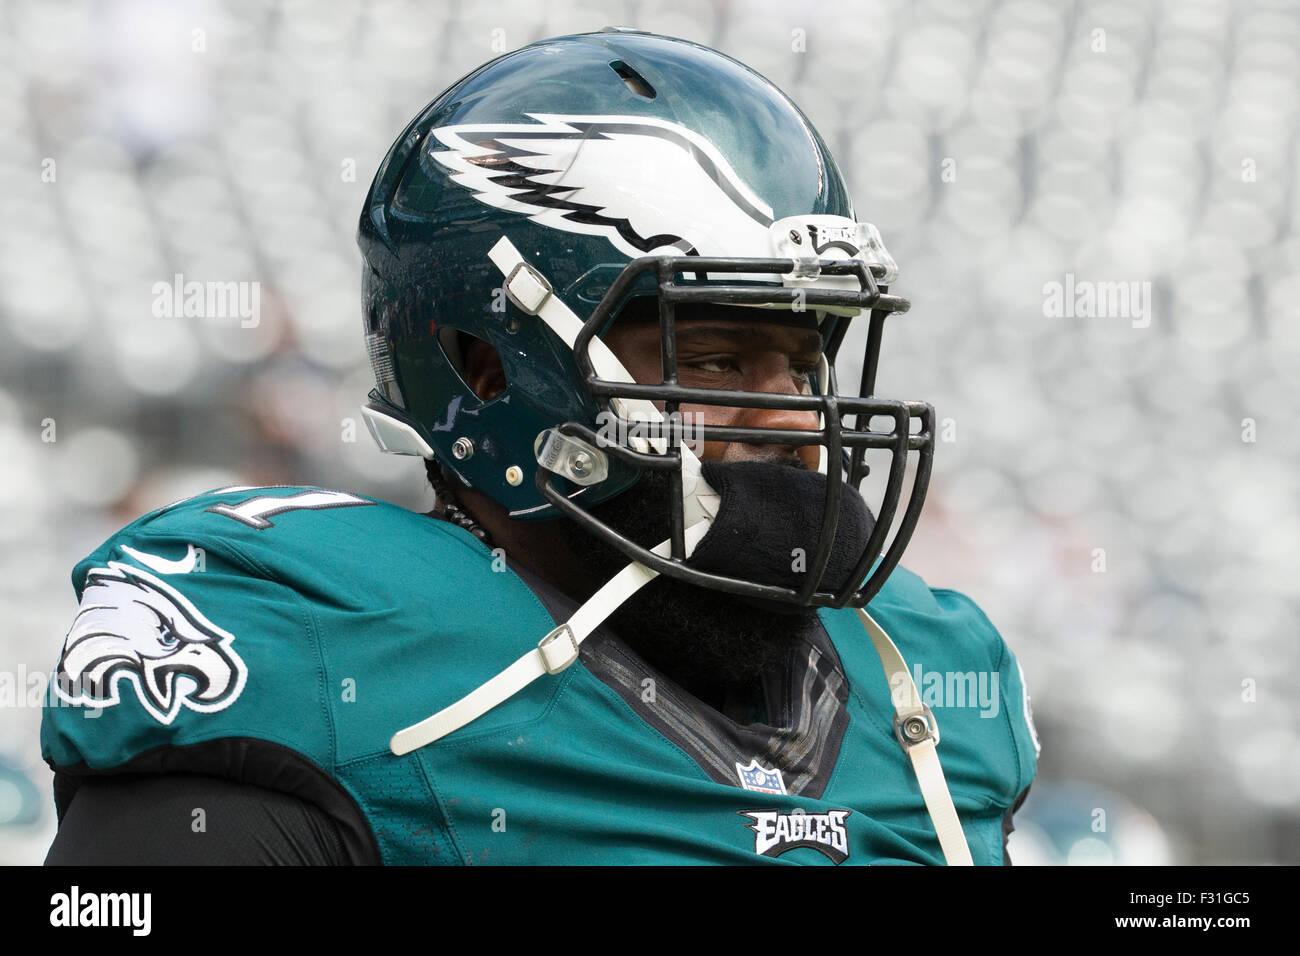 buy online c8ce0 8abb9 September 27, 2015, Philadelphia Eagles tackle Jason Peters ...